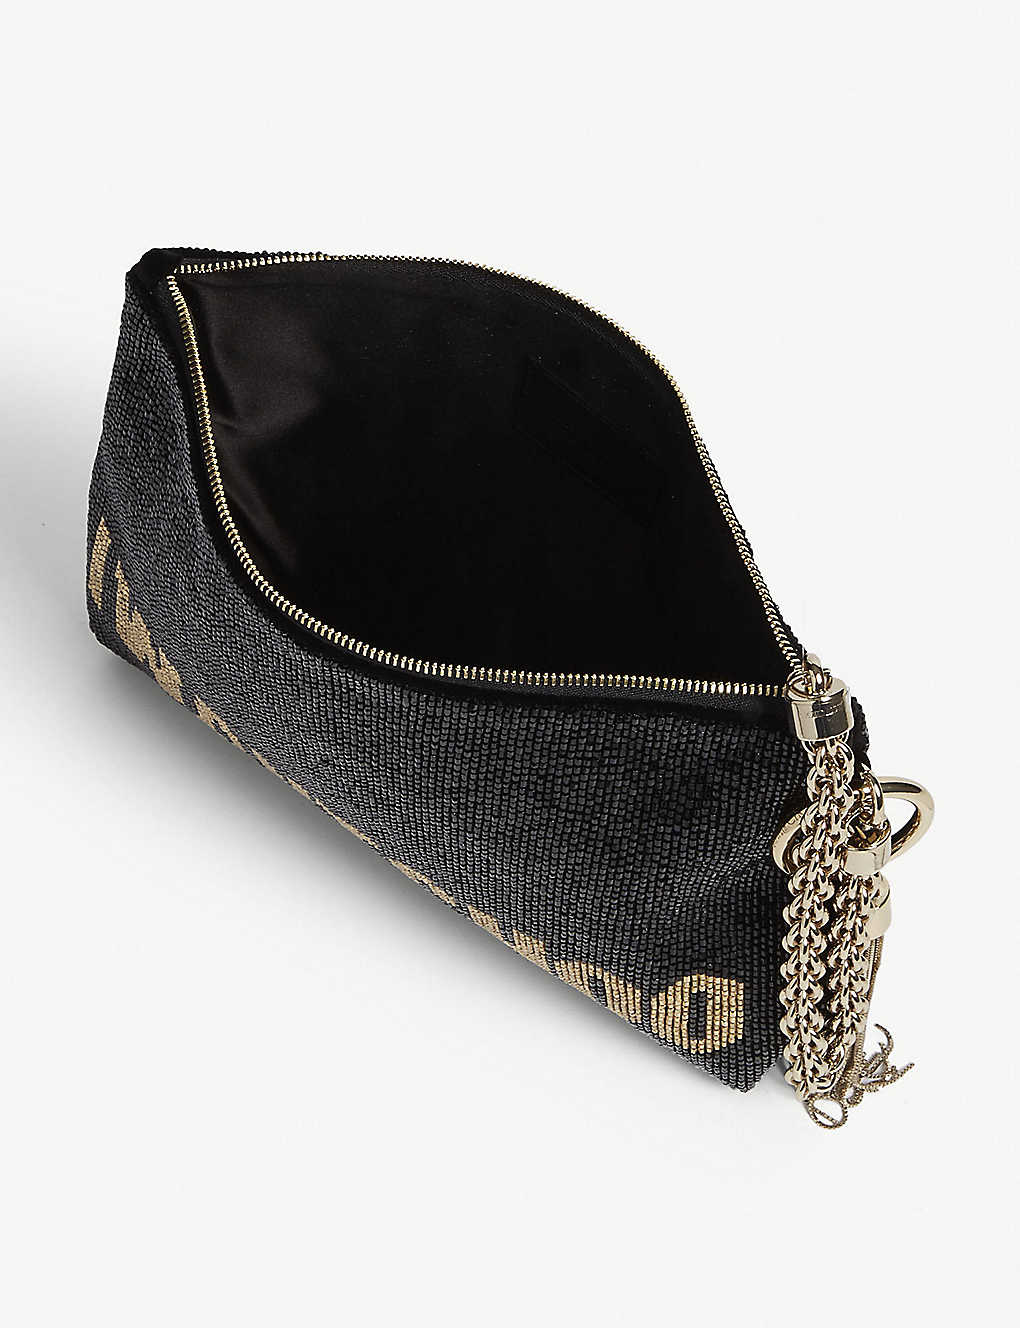 75dd709962 JIMMY CHOO - Callie I WANT CHOO beaded clutch bag | Selfridges.com